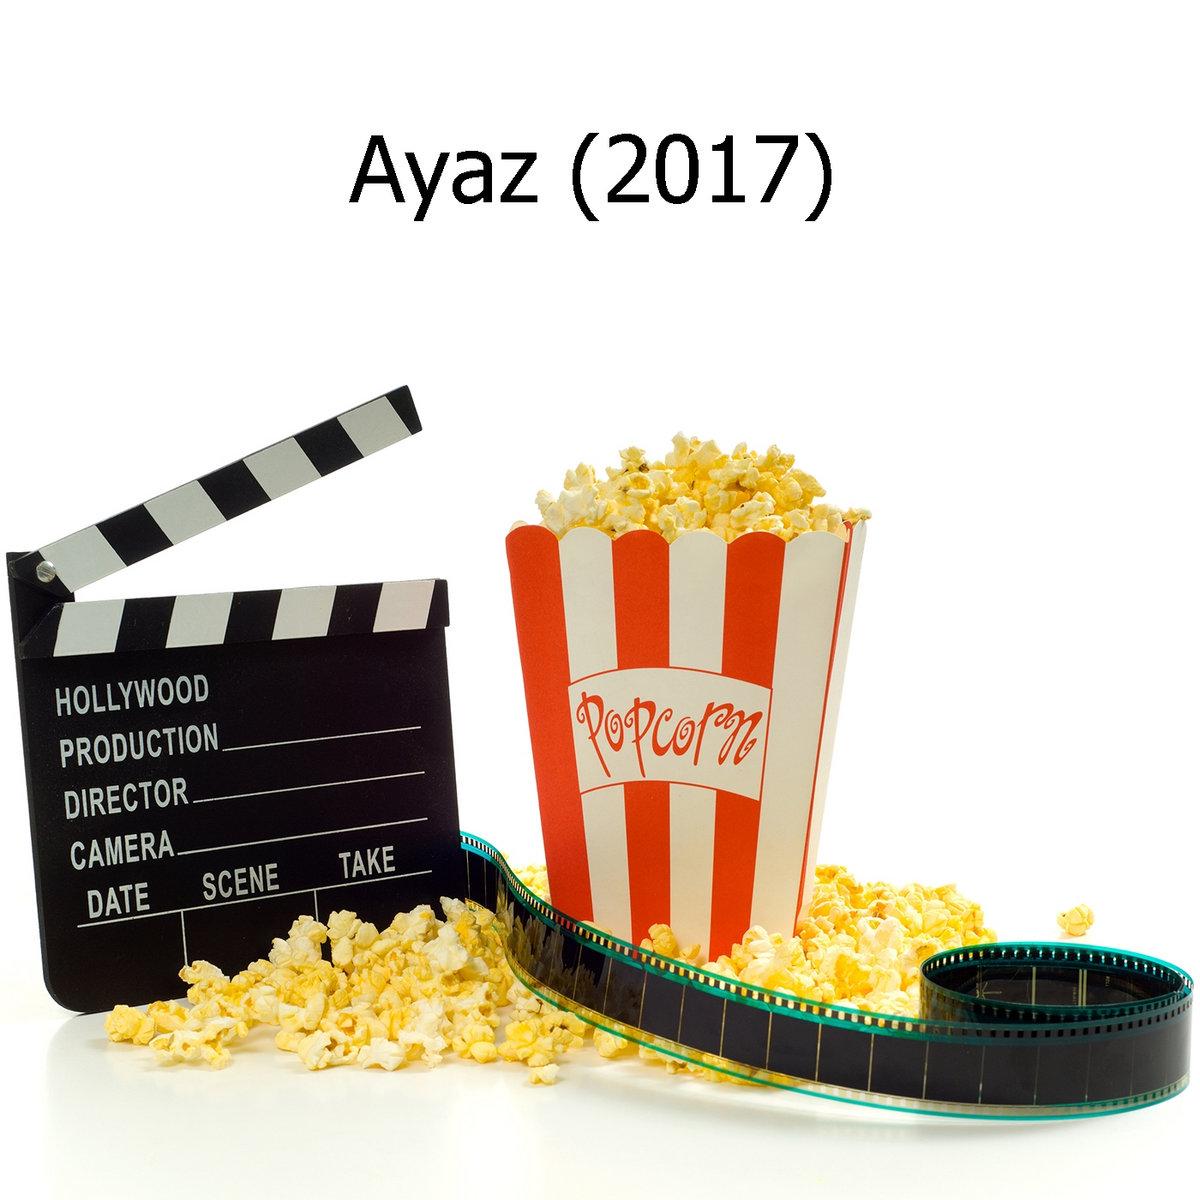 Free movie mela: dangal full hd movie download torrent (2016)-free.